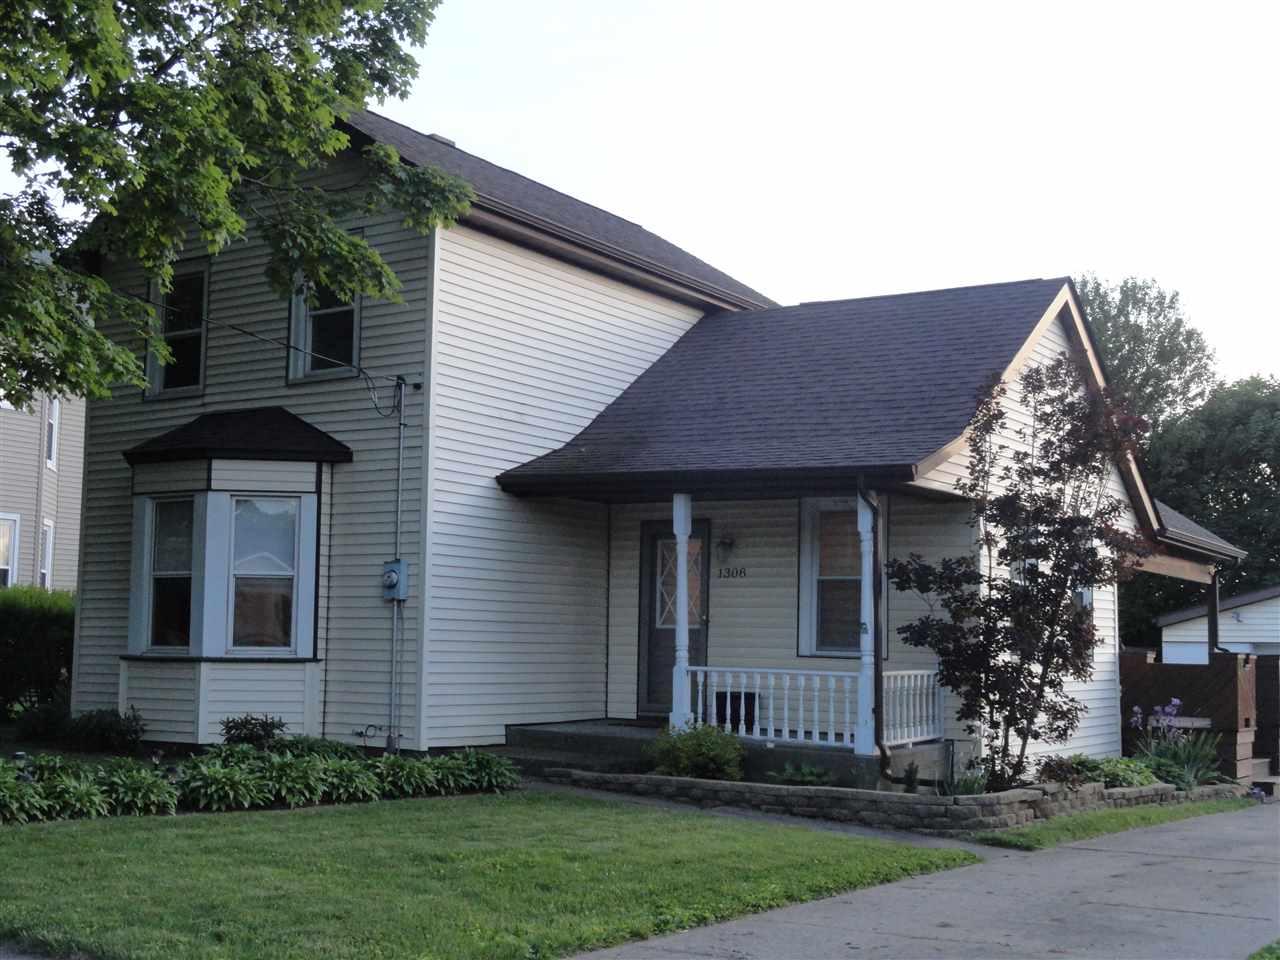 Real Estate for Sale, ListingId: 33519670, Orion,IL61273